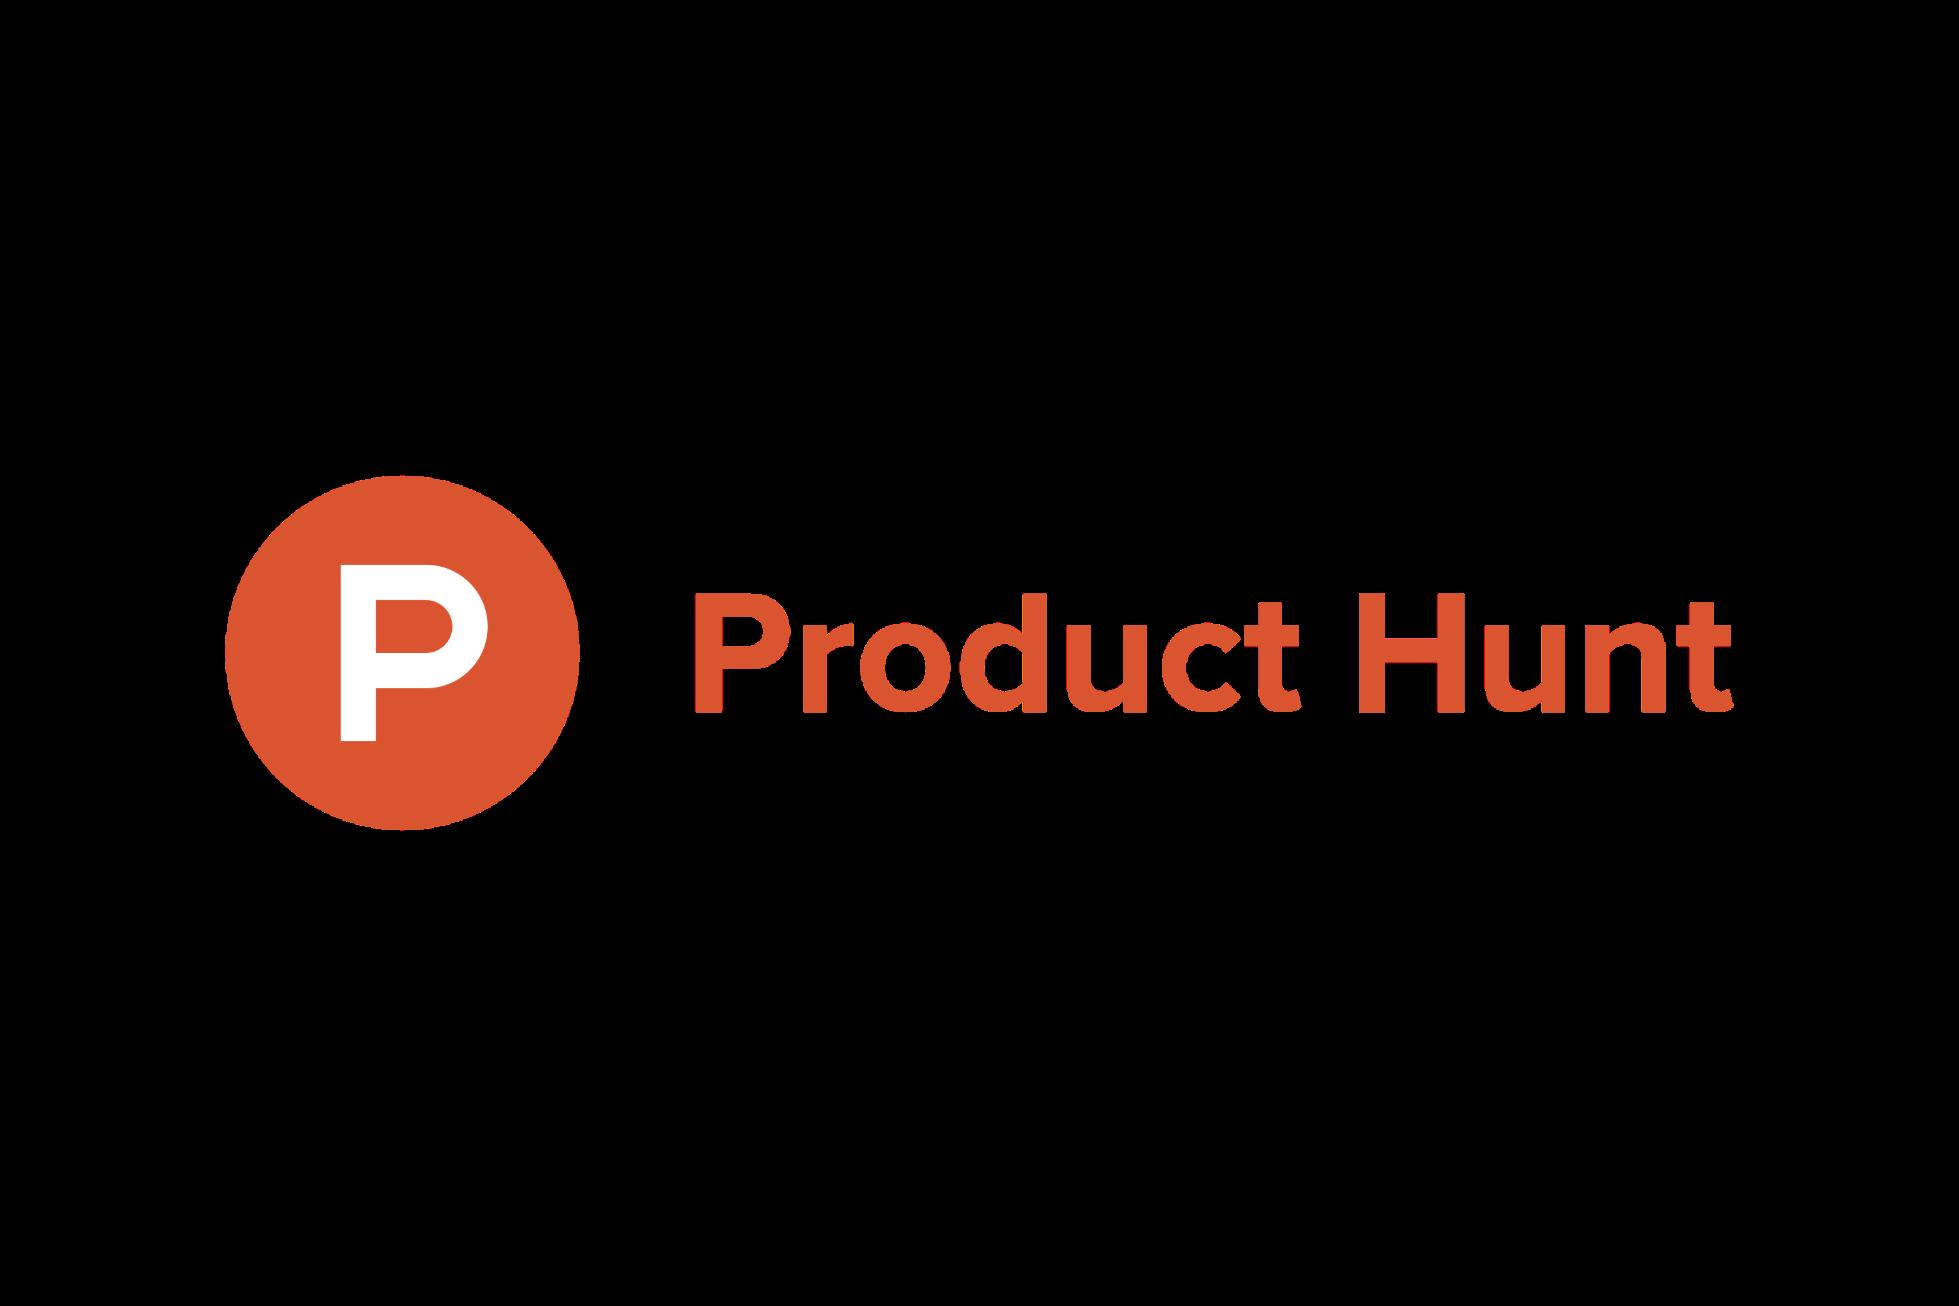 Product hunt logo.wine